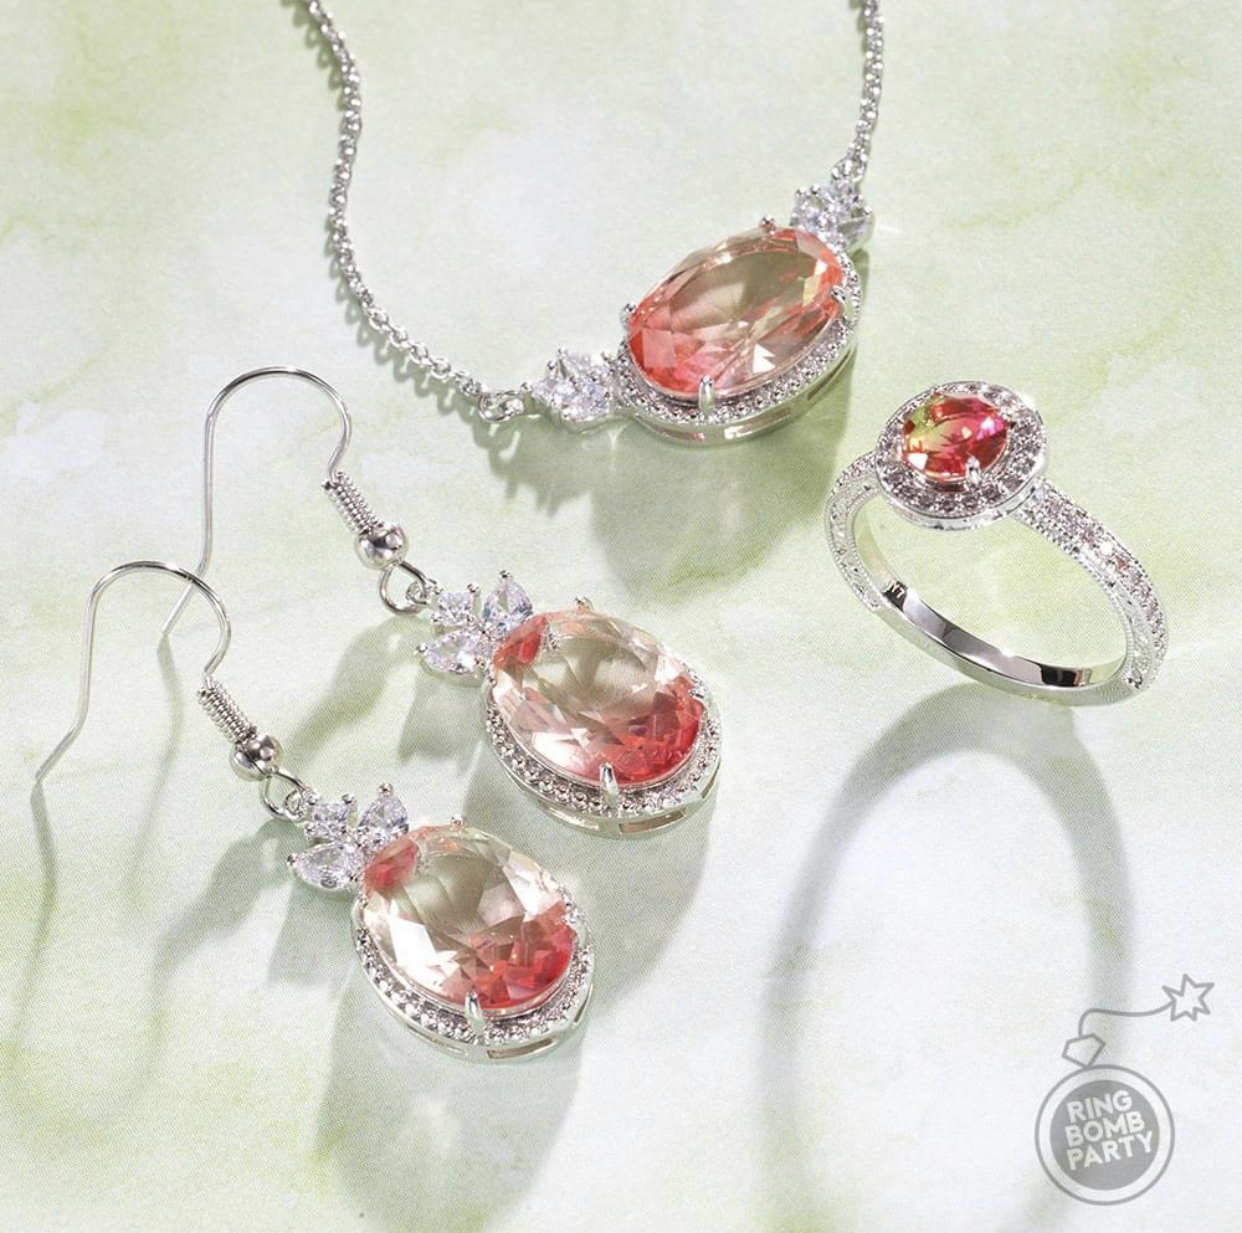 Original Necklaces & Earrings